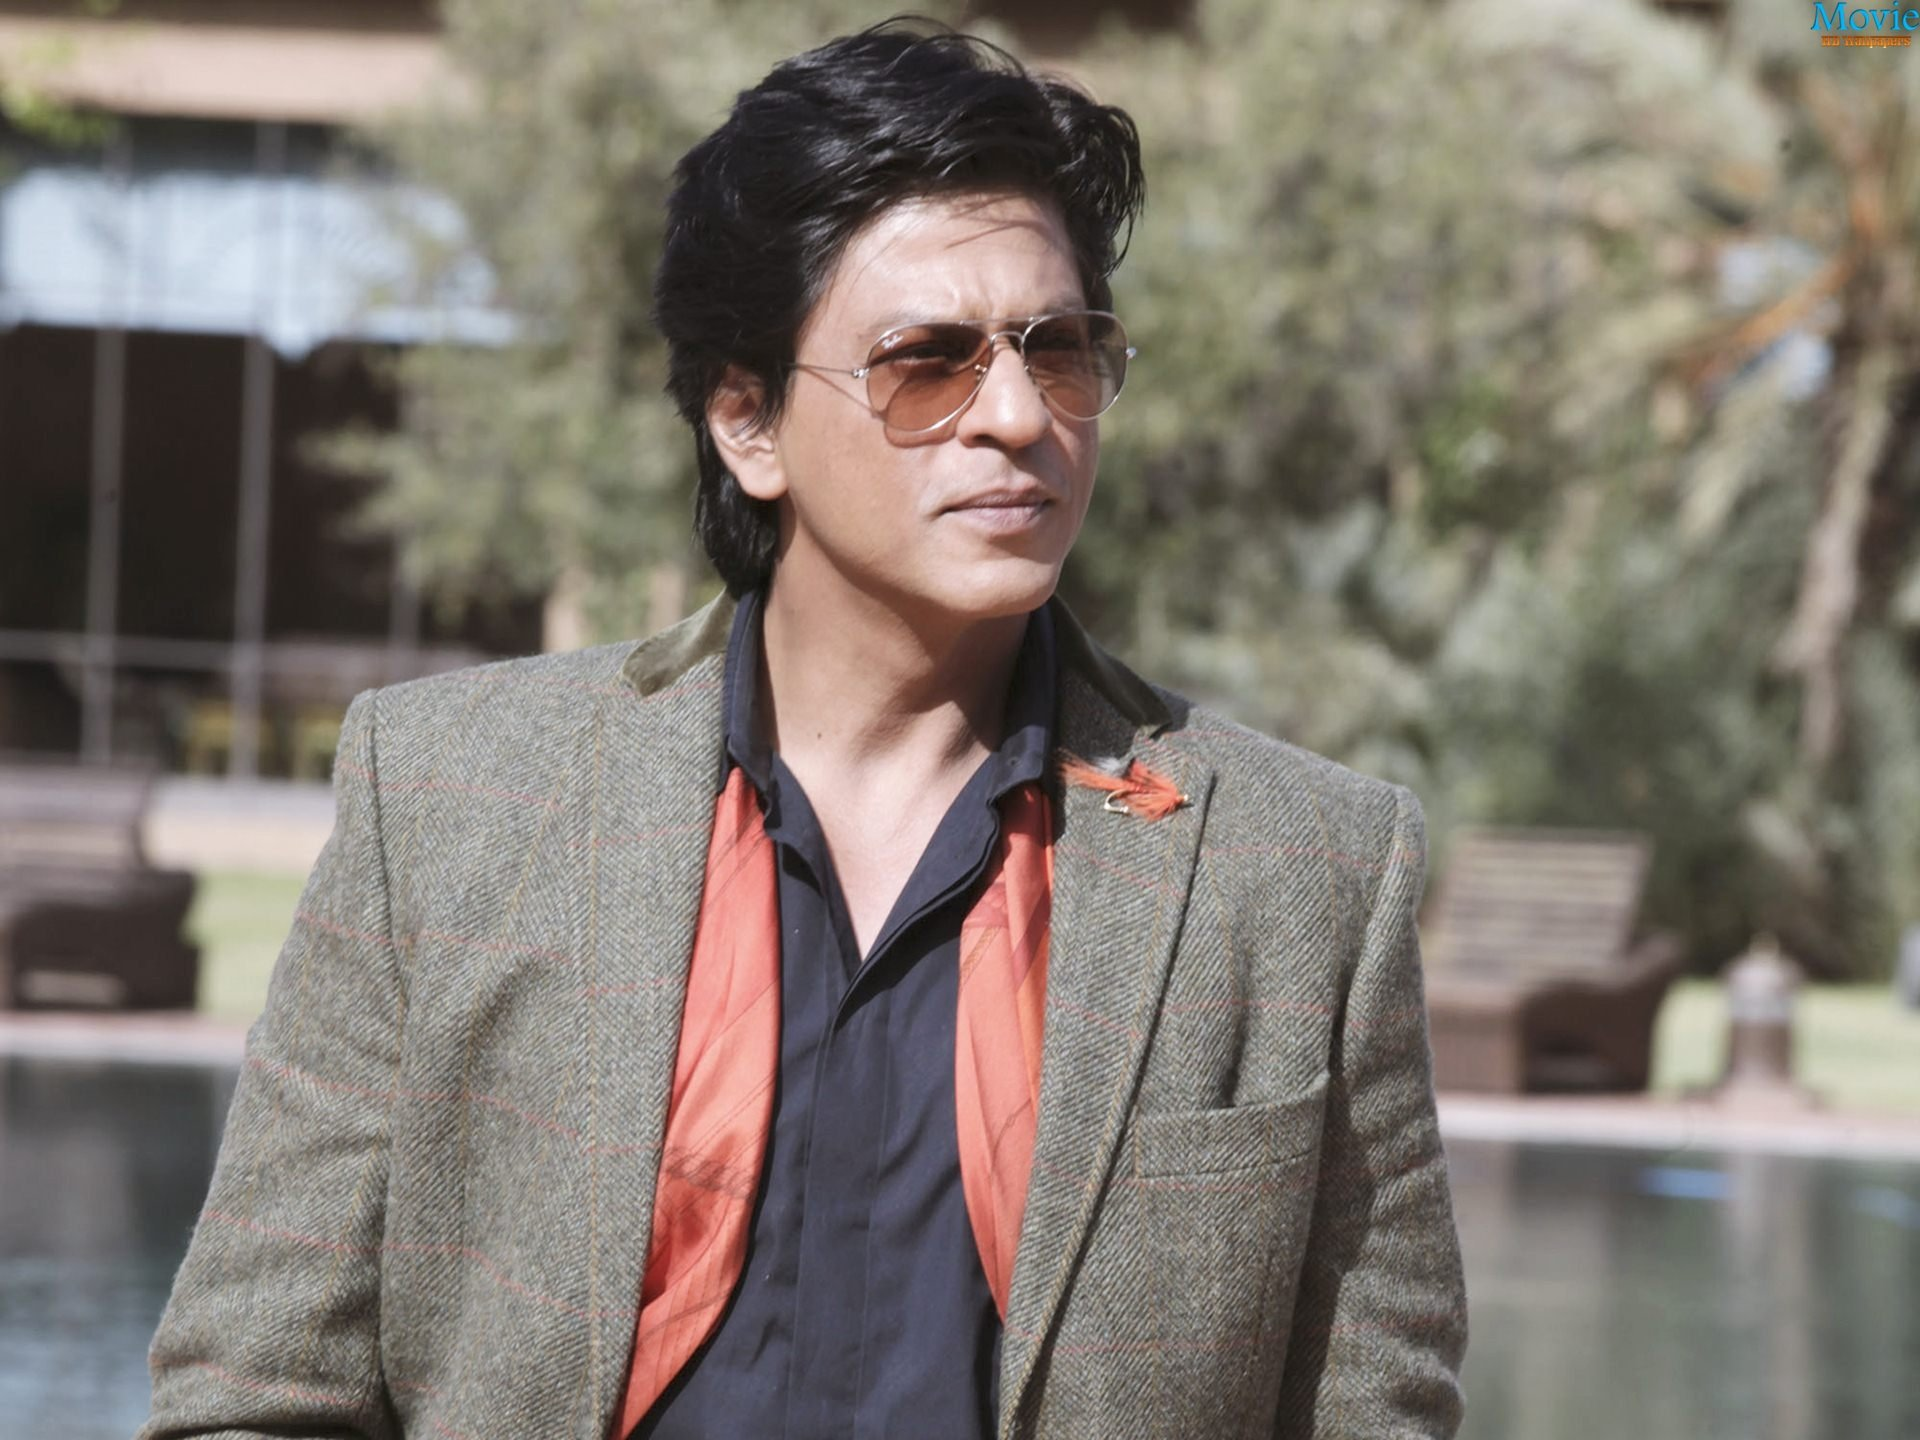 Shahrukh Khan Wallpapers Hd Happy New Year Style Shah Rukh